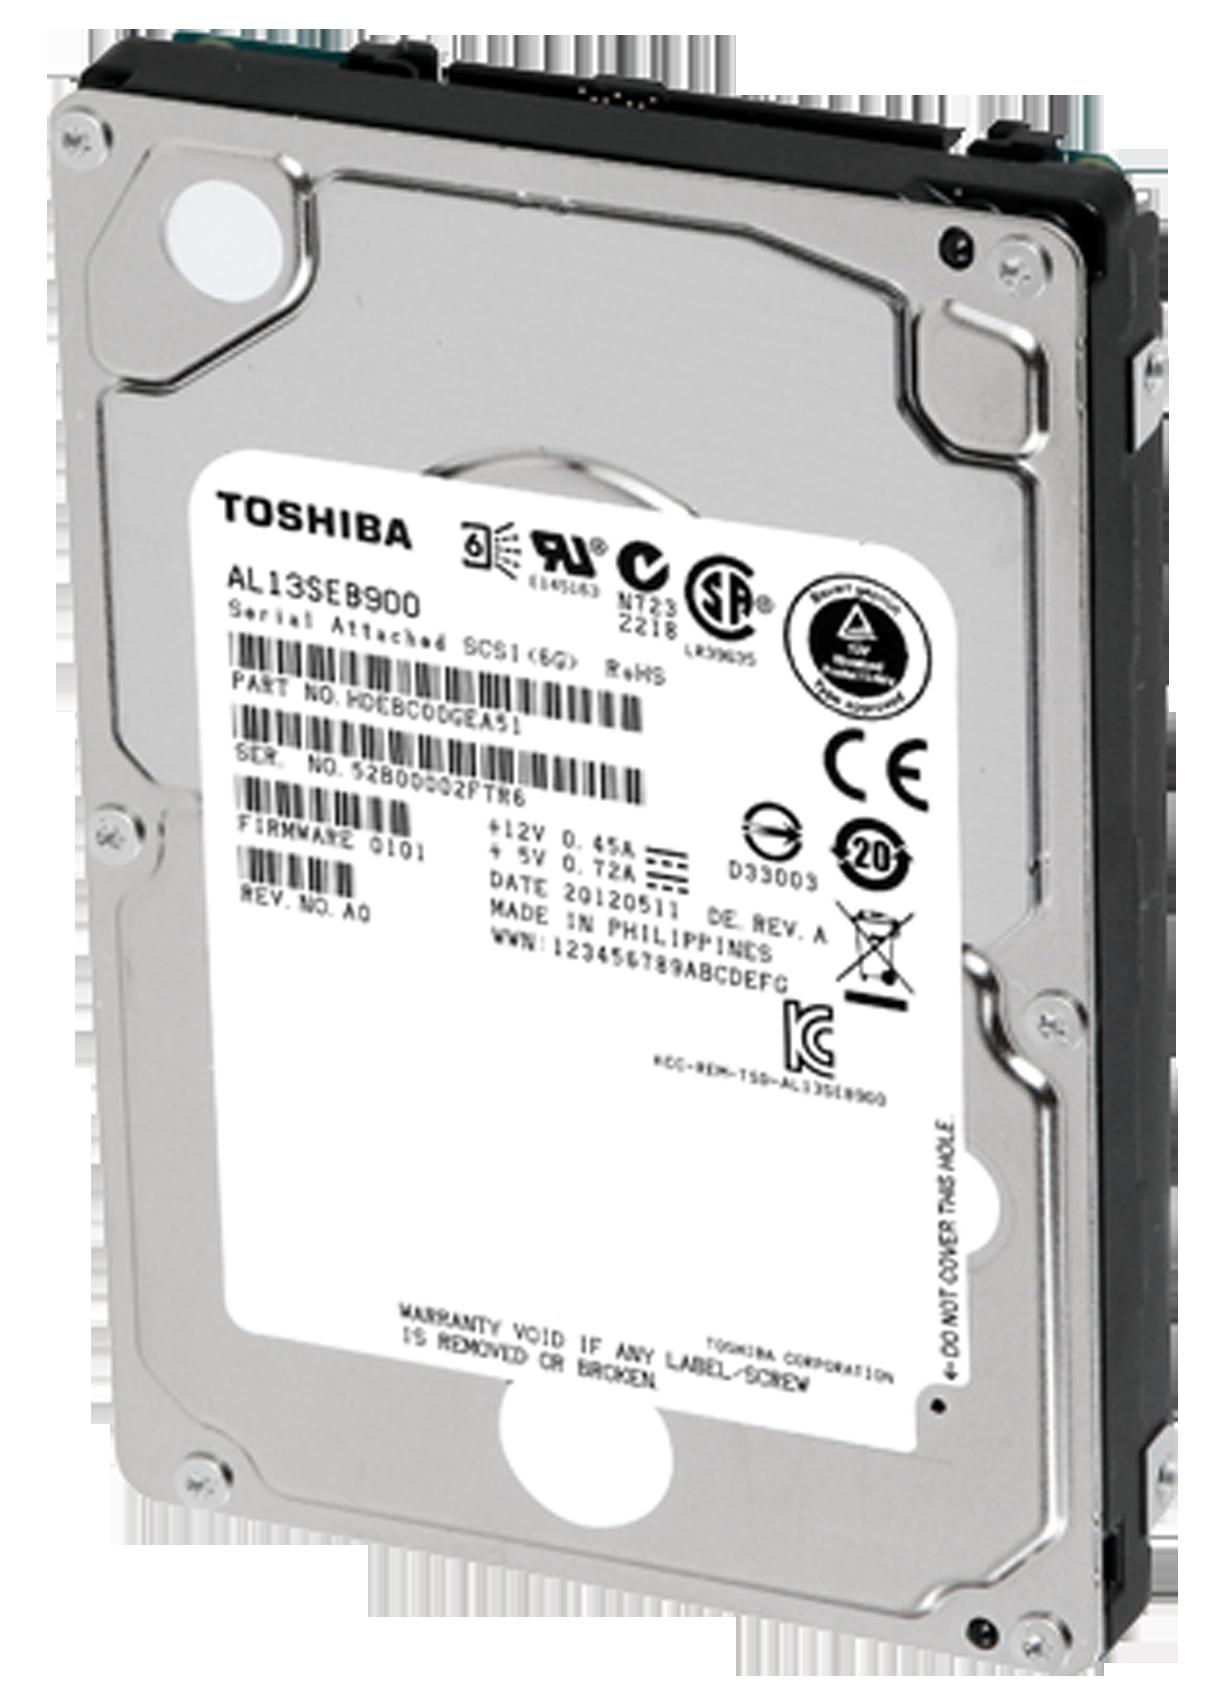 TOSHIBA ANNOUNCES NEXT-GENERATION 10,000 RPM-CLASS ENTERPRISE STORAGE HARD  DISK DRIVE SERIES - Press - Toshiba - Hard Drive PNG HD